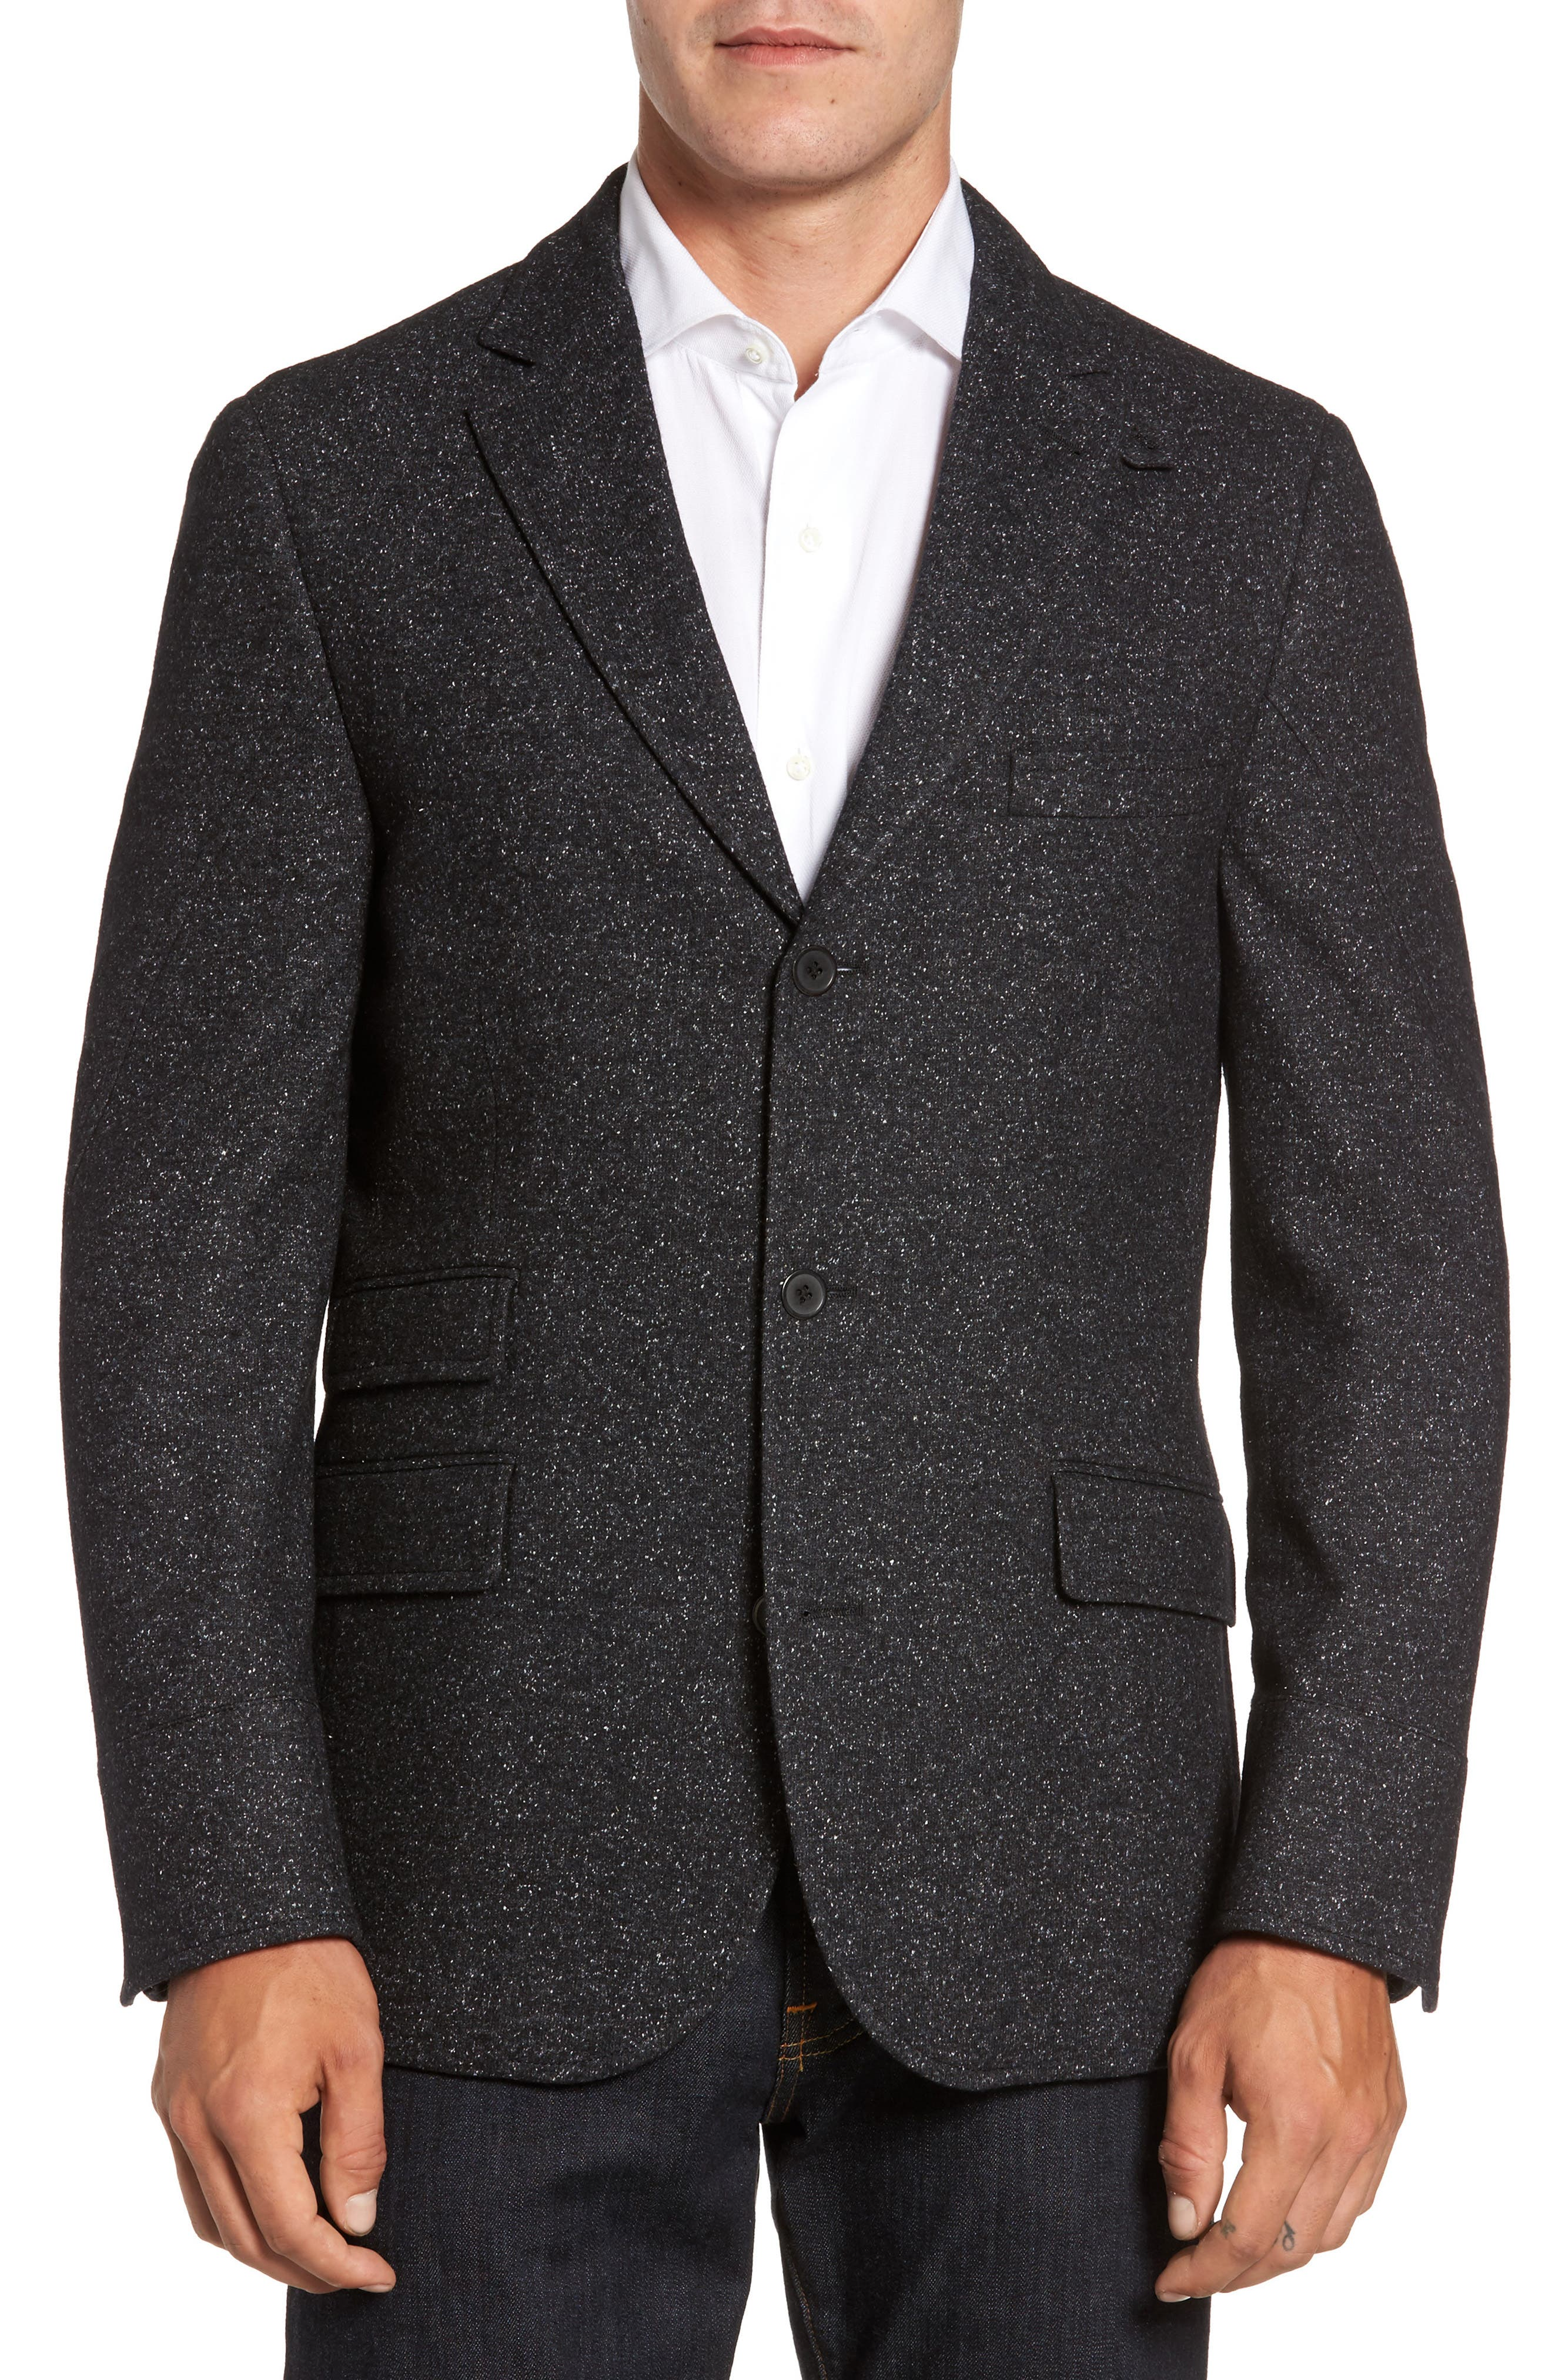 Donegal Wool Blend Hybrid Coat,                             Alternate thumbnail 4, color,                             Charcoal